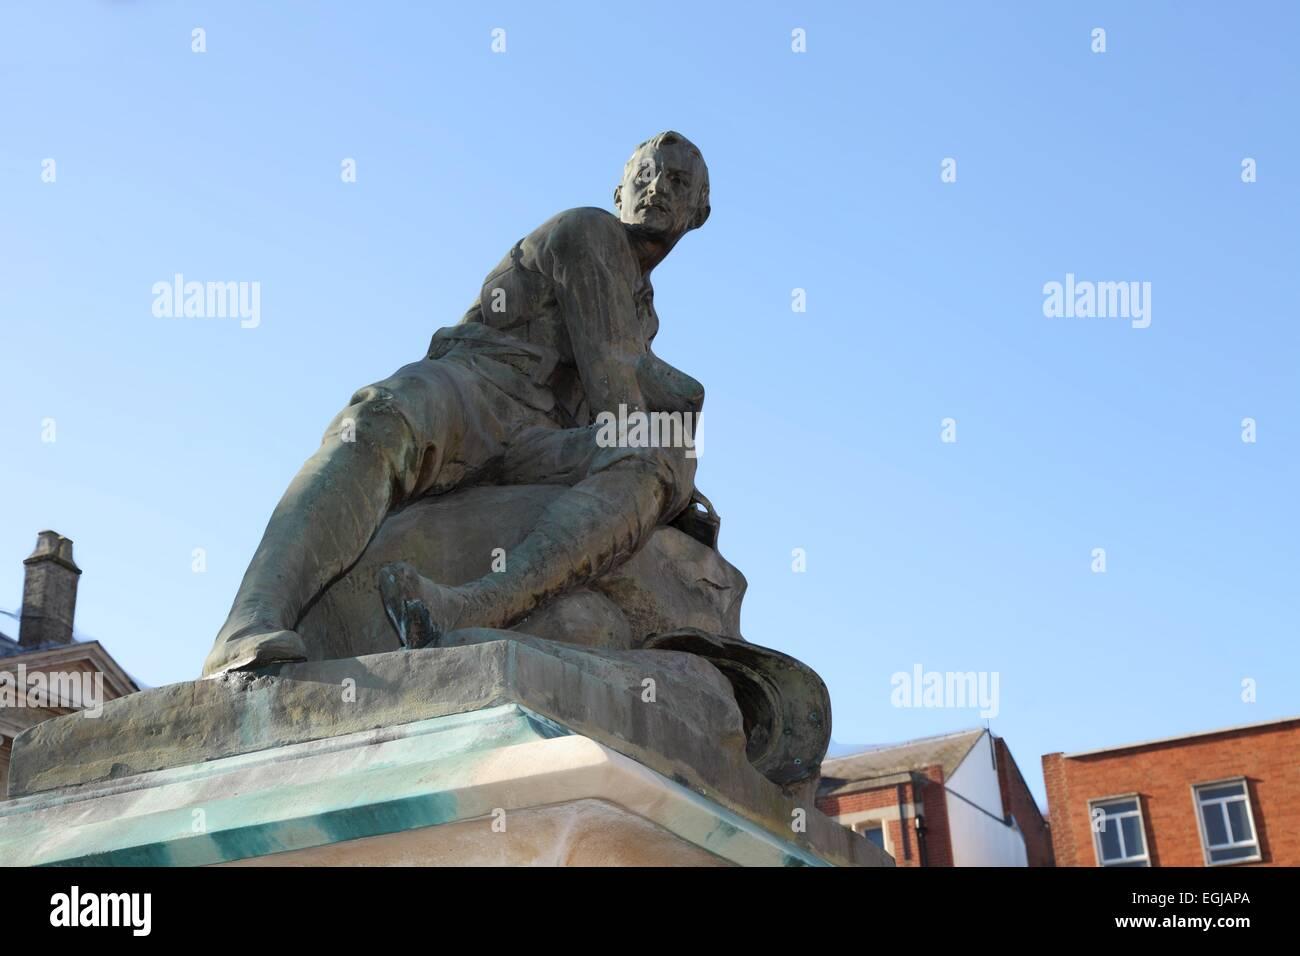 Boer war memorial in Bury St Edmunds, Suffolk, UK - Stock Image